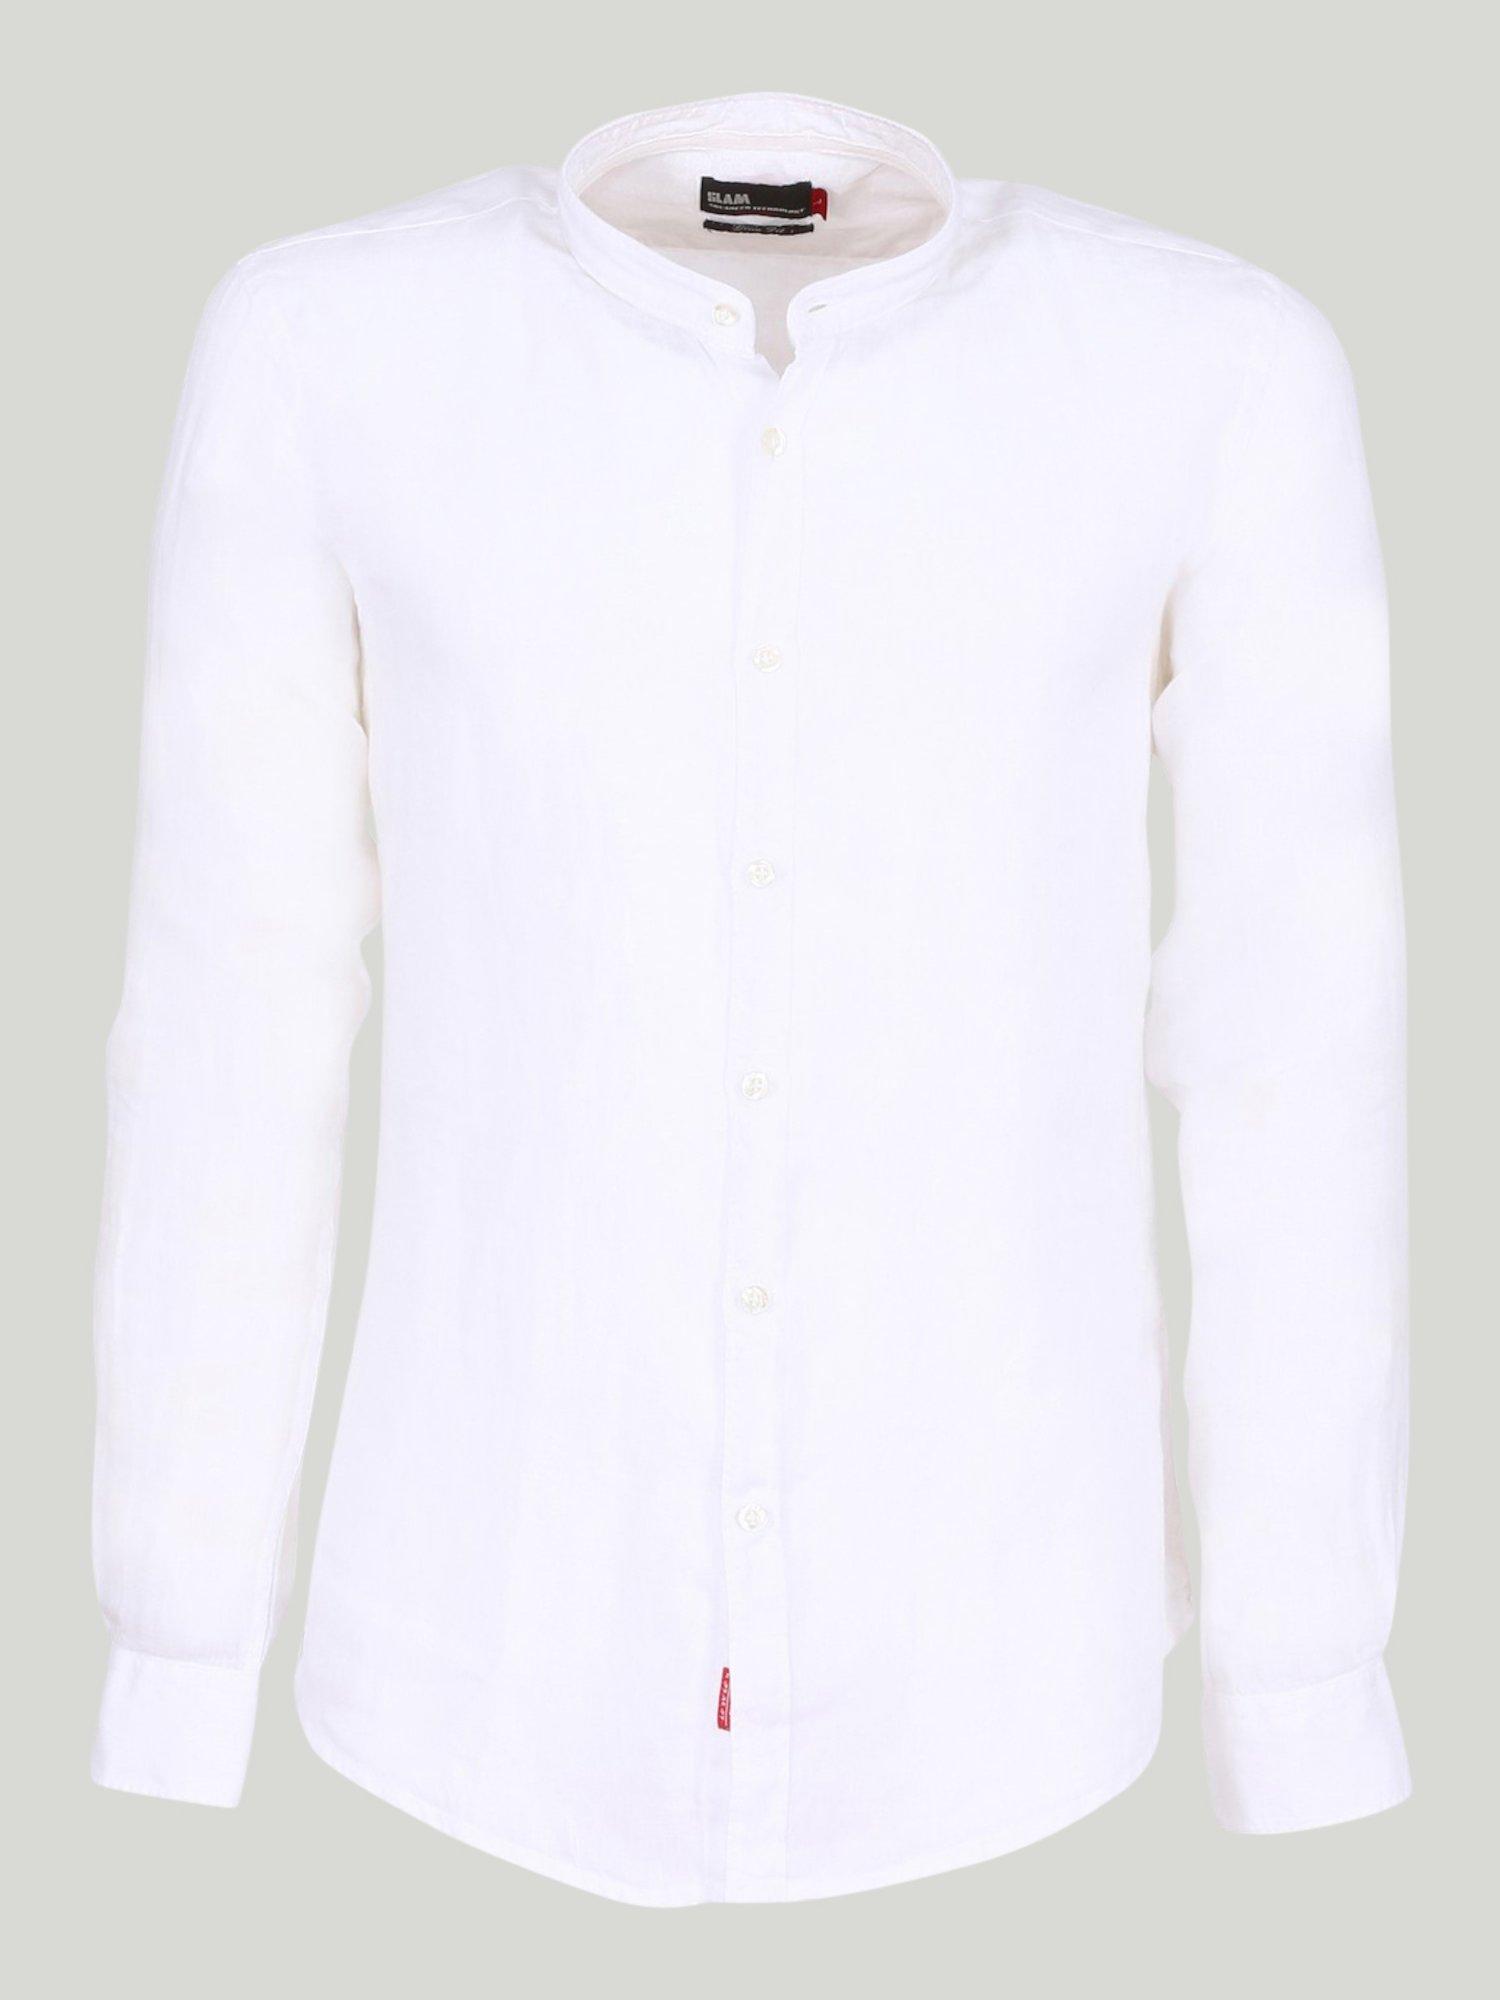 Bollard shirt - White